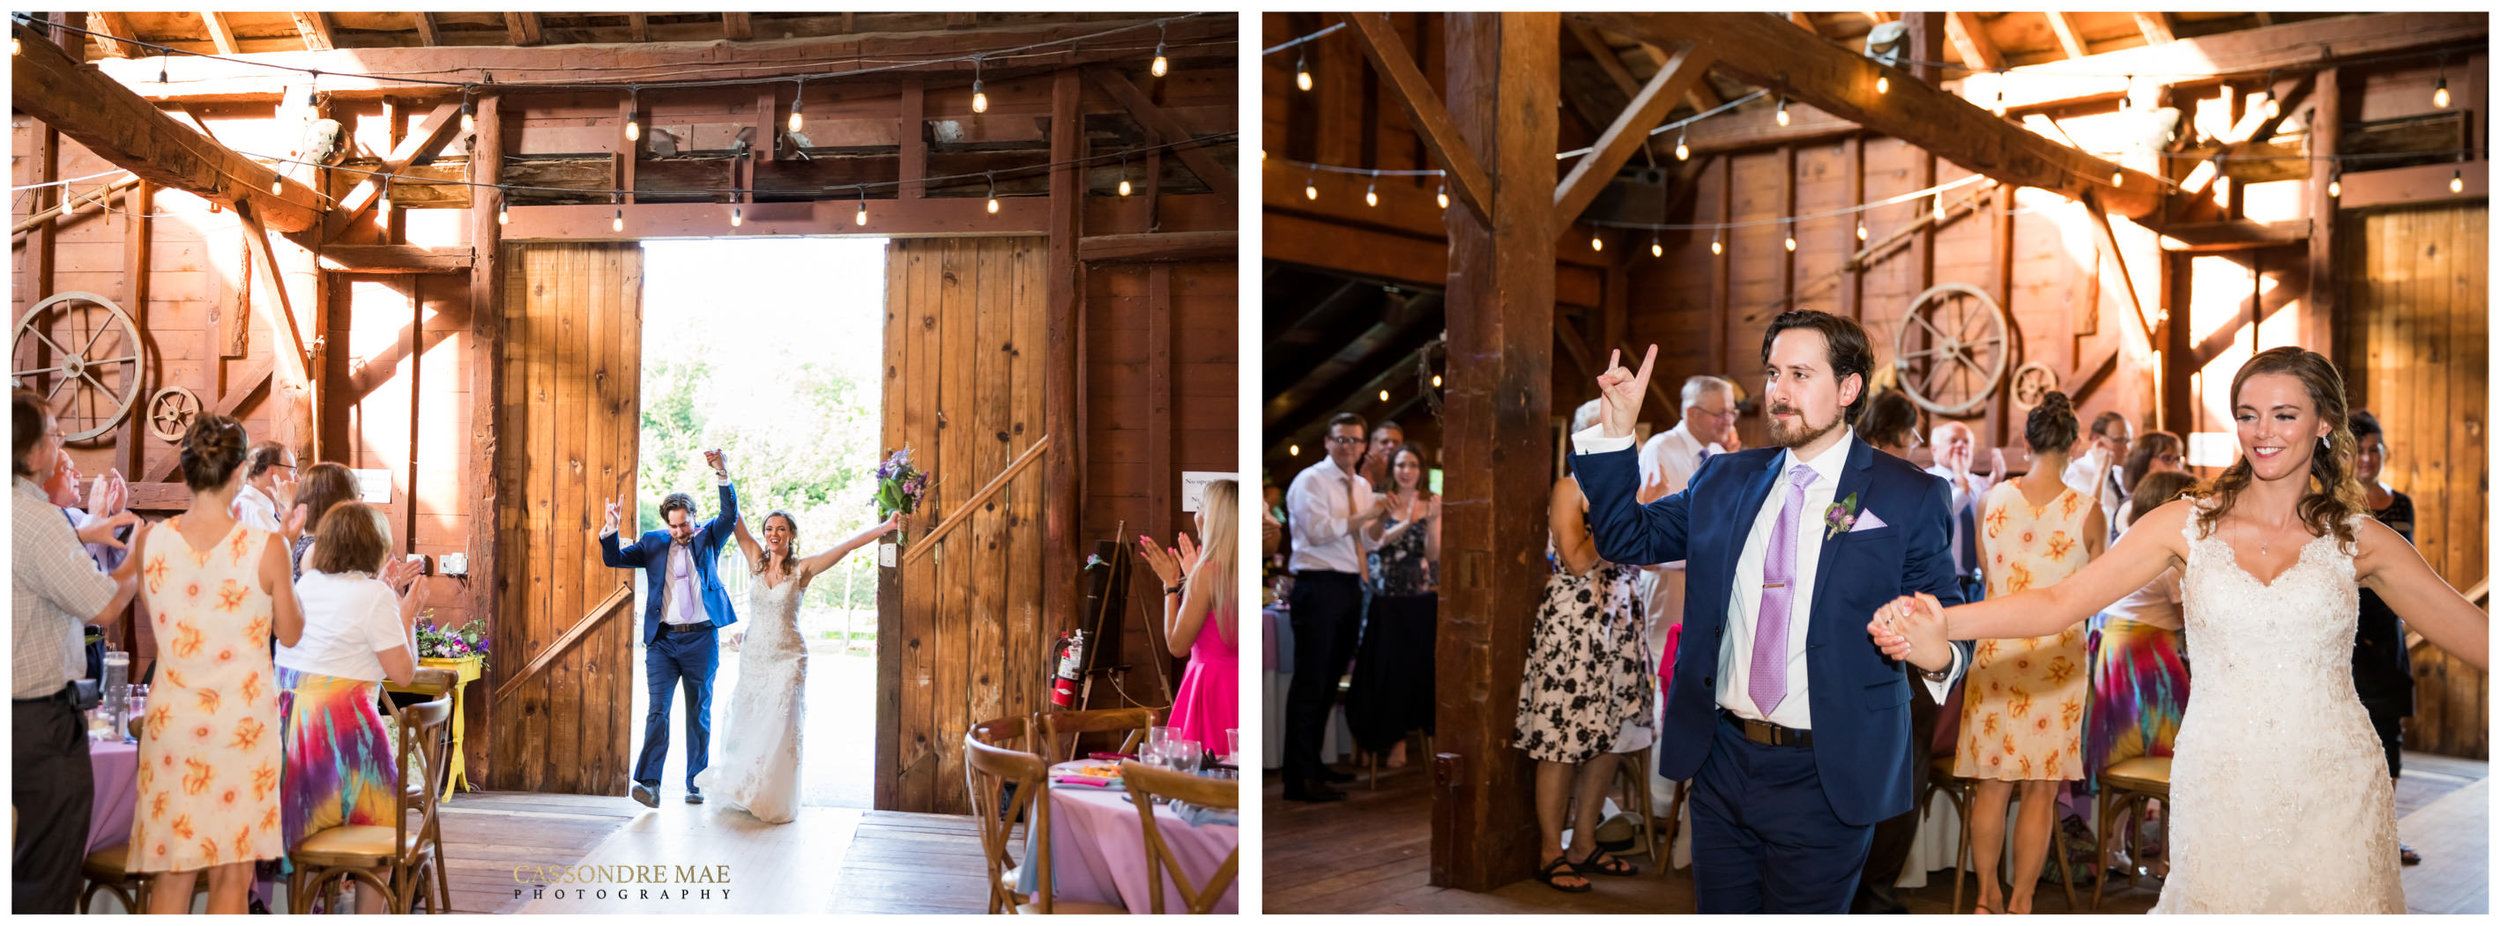 Cassondre Mae Photography hudson valley barn weddings -15.jpg